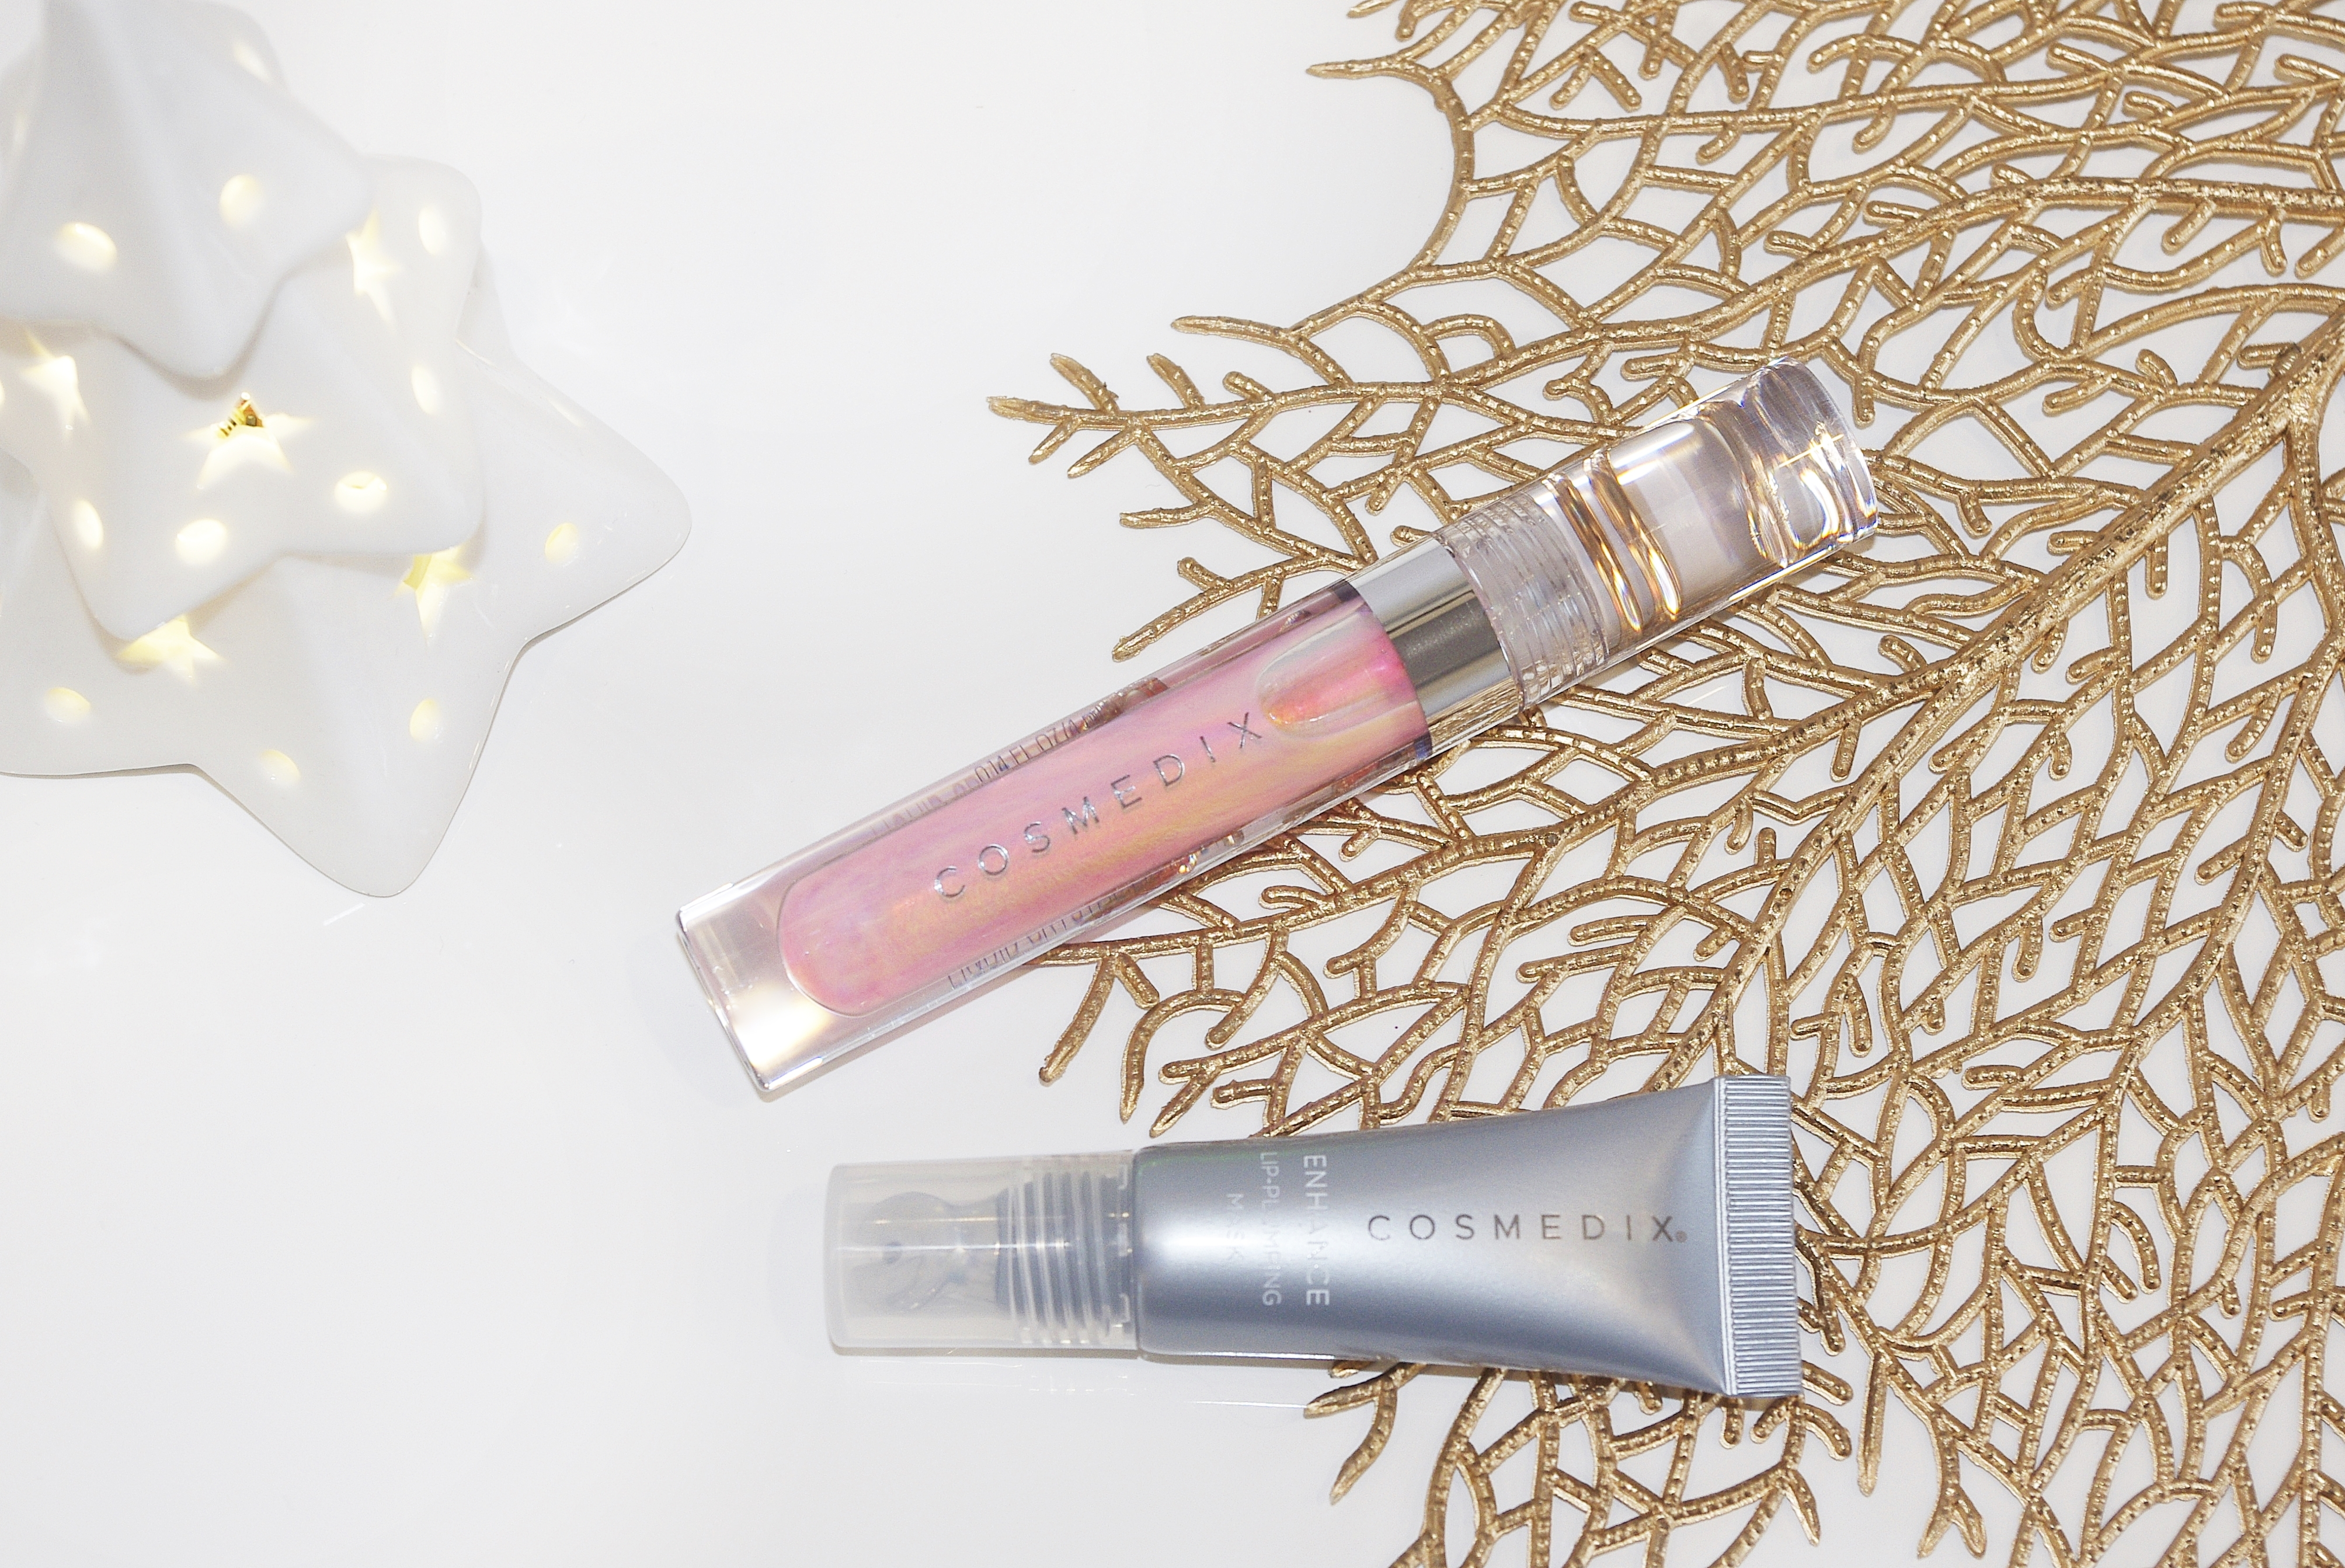 cosmedix Enhance Lip-Plumping Mask Lumi Crystal Liquid Lip Hydrator